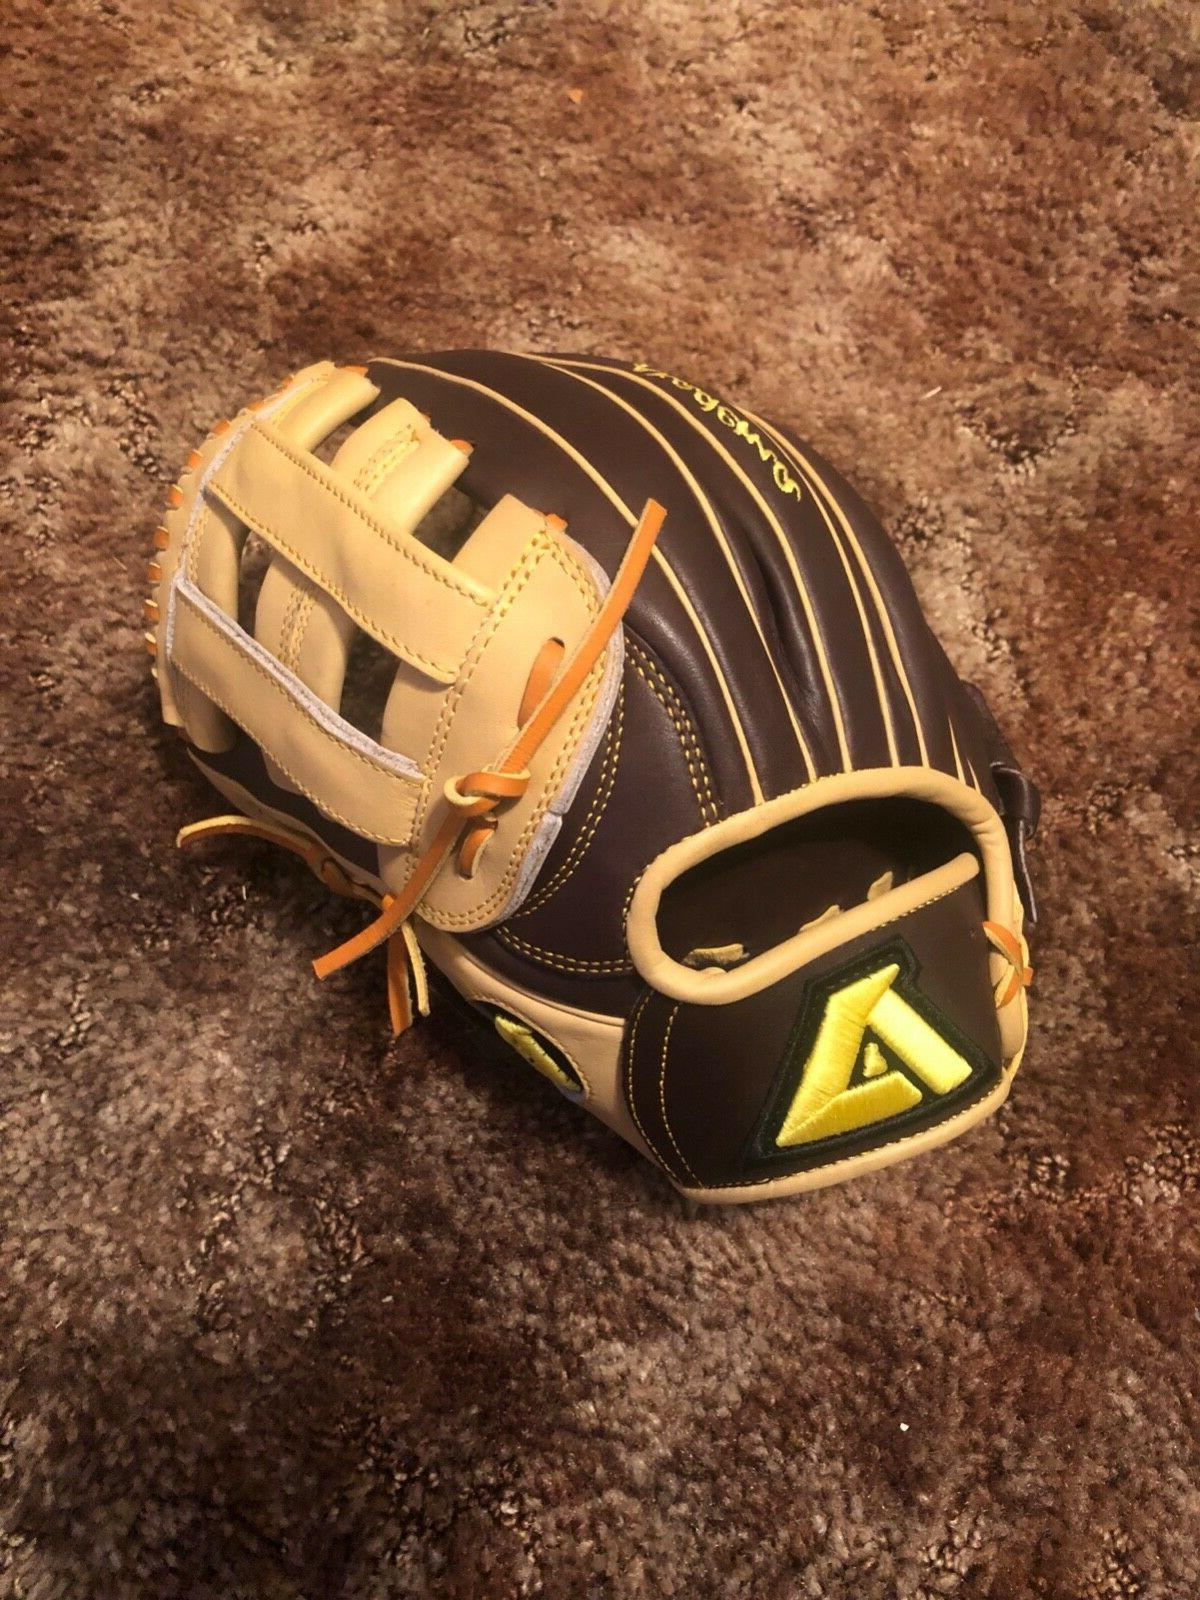 brand new baseball gloves used one time